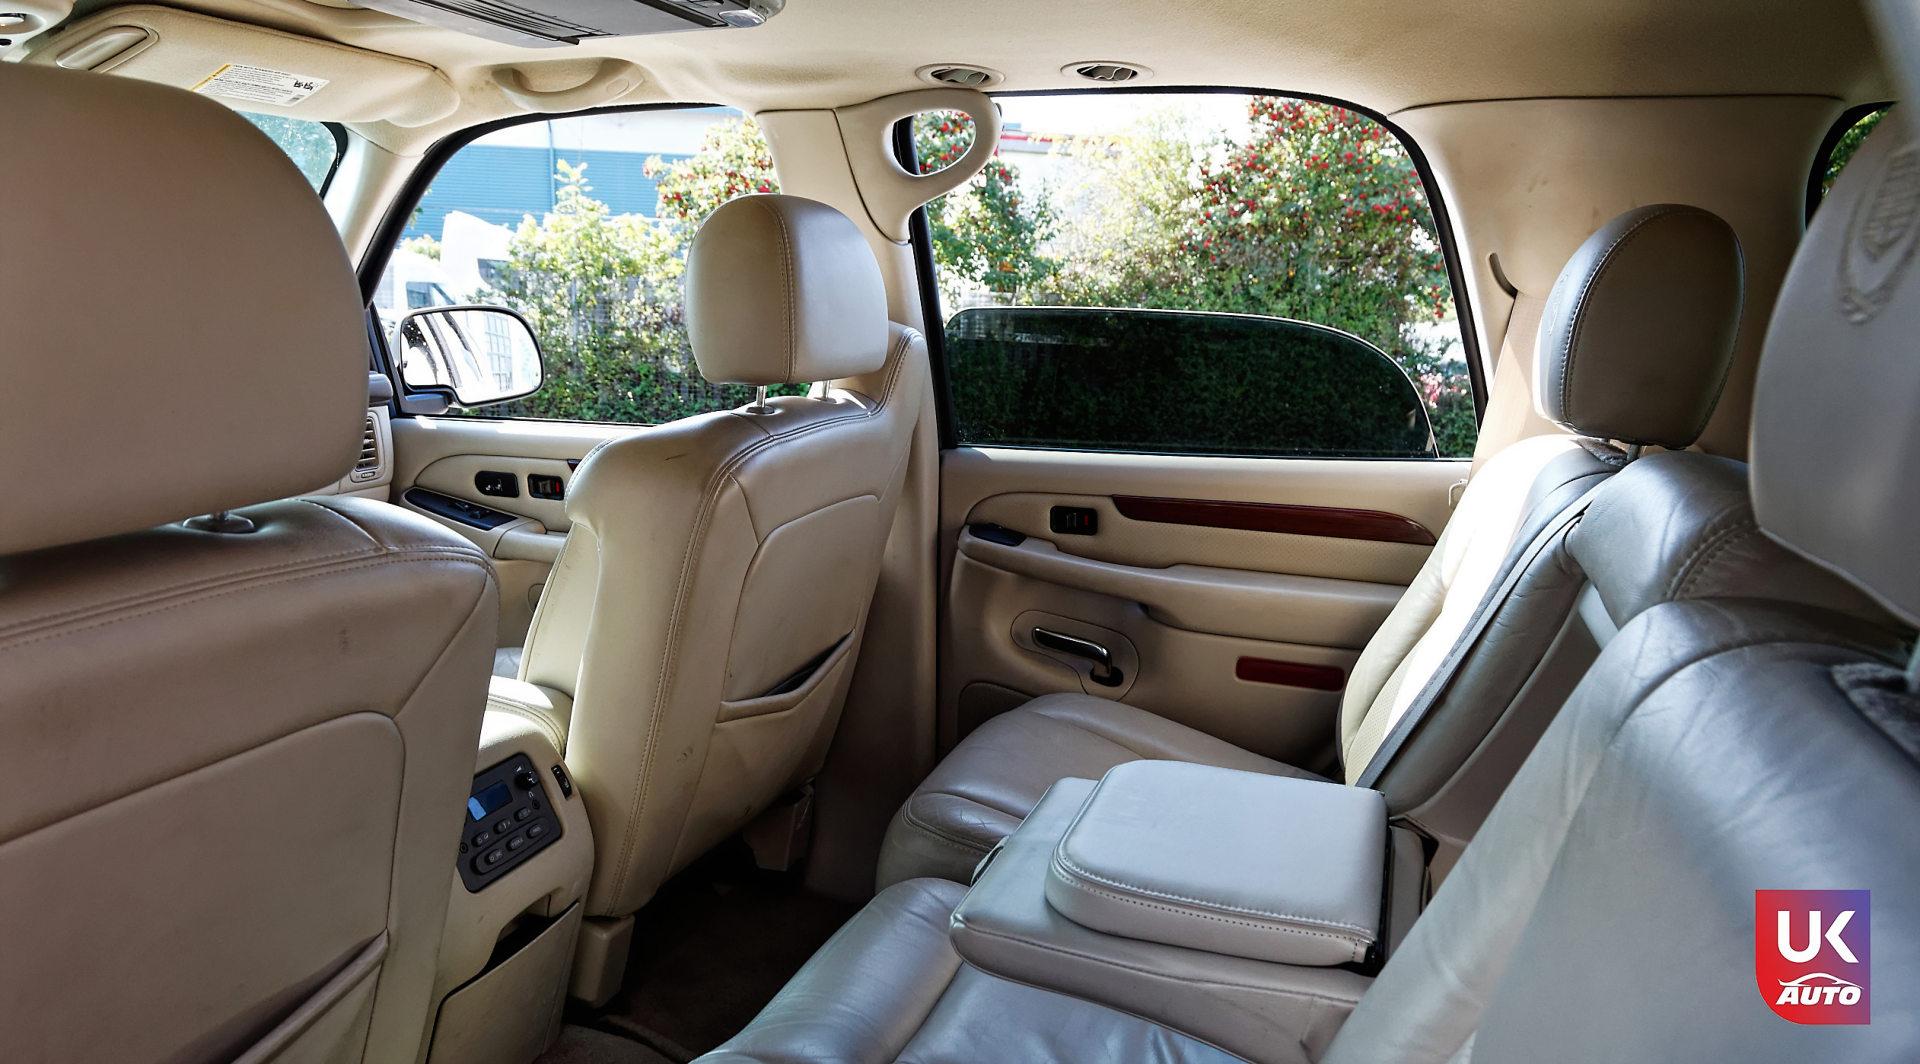 Cadillac Escalade lhd import cadillac angleterre cadillac uk ukauto us import lhd9 DxO - AUTO IMPORT CADILLAC ESCALADE V8 LHD IMPORTATION CADILLAC LHD FELICITATION A BERTRAND